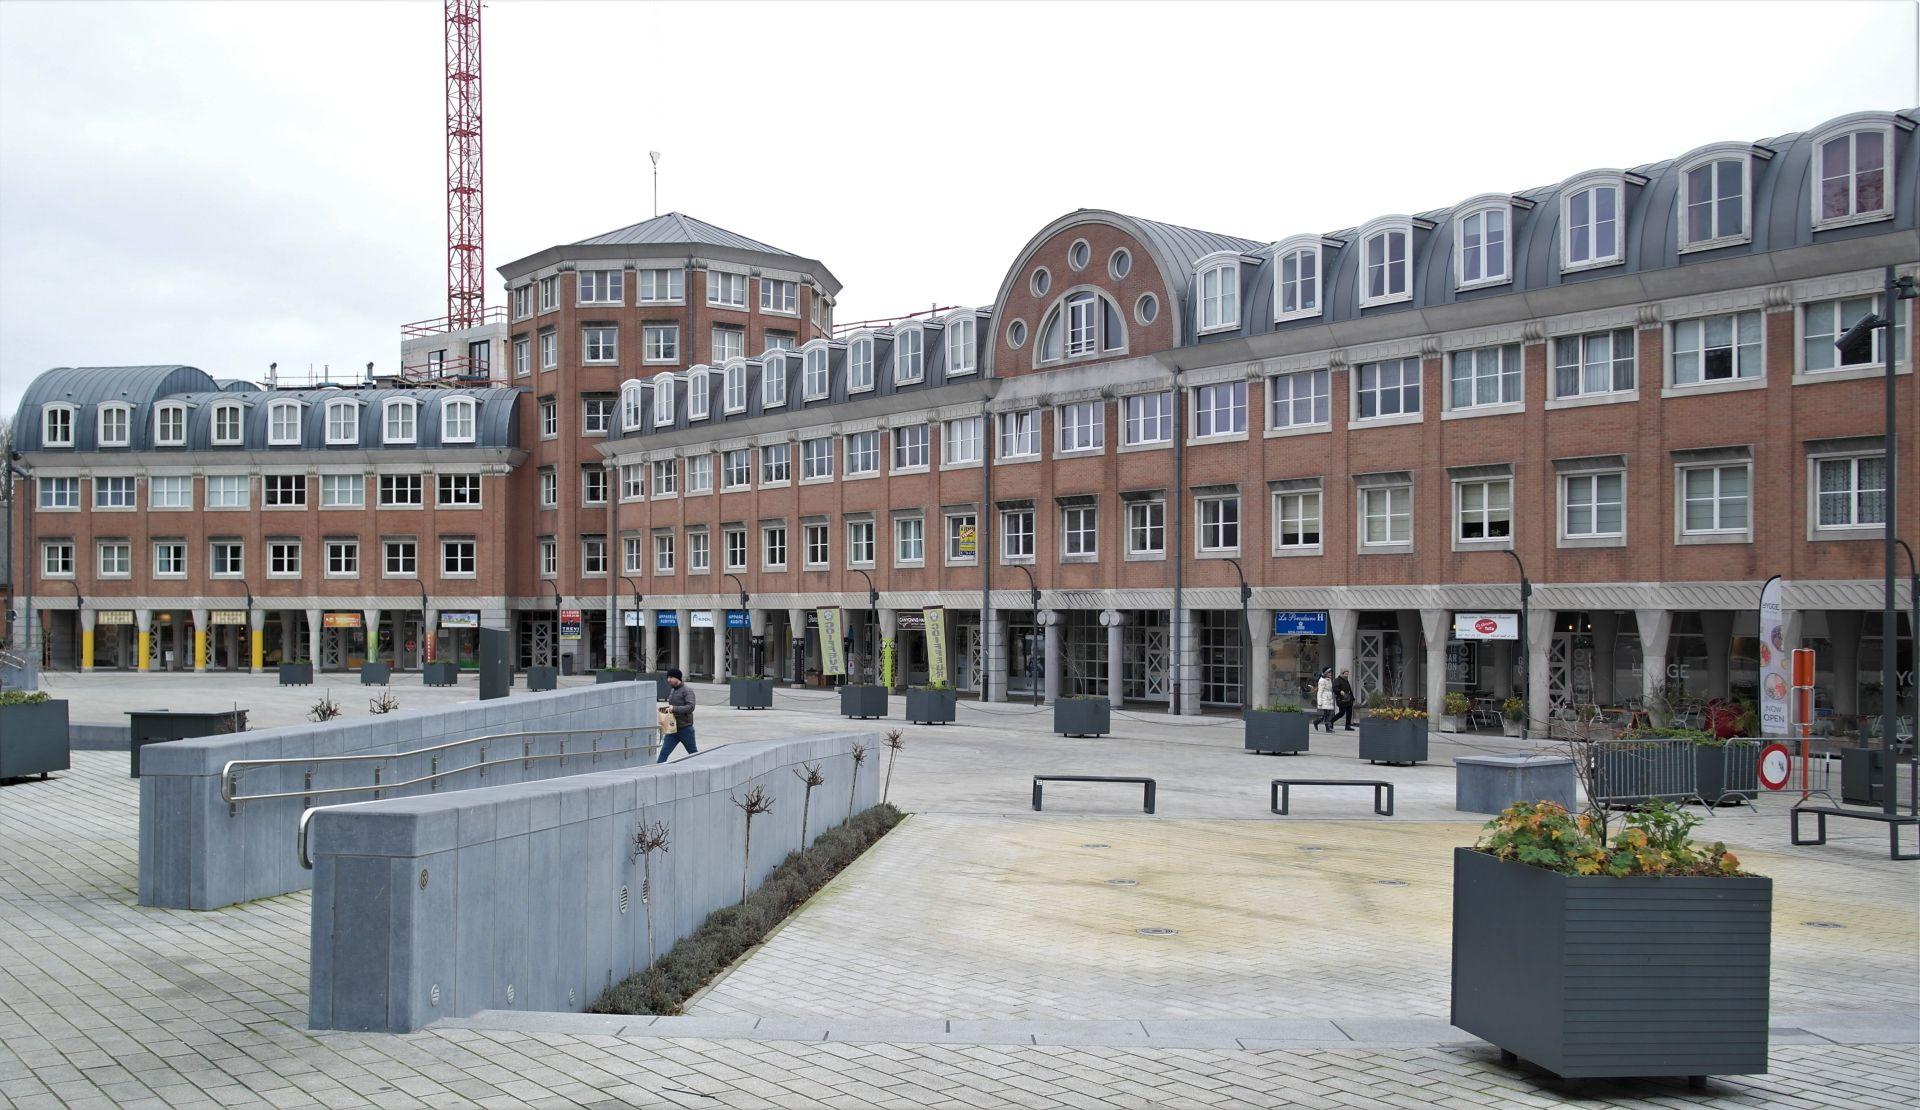 Inventaire du patrimoine architectural